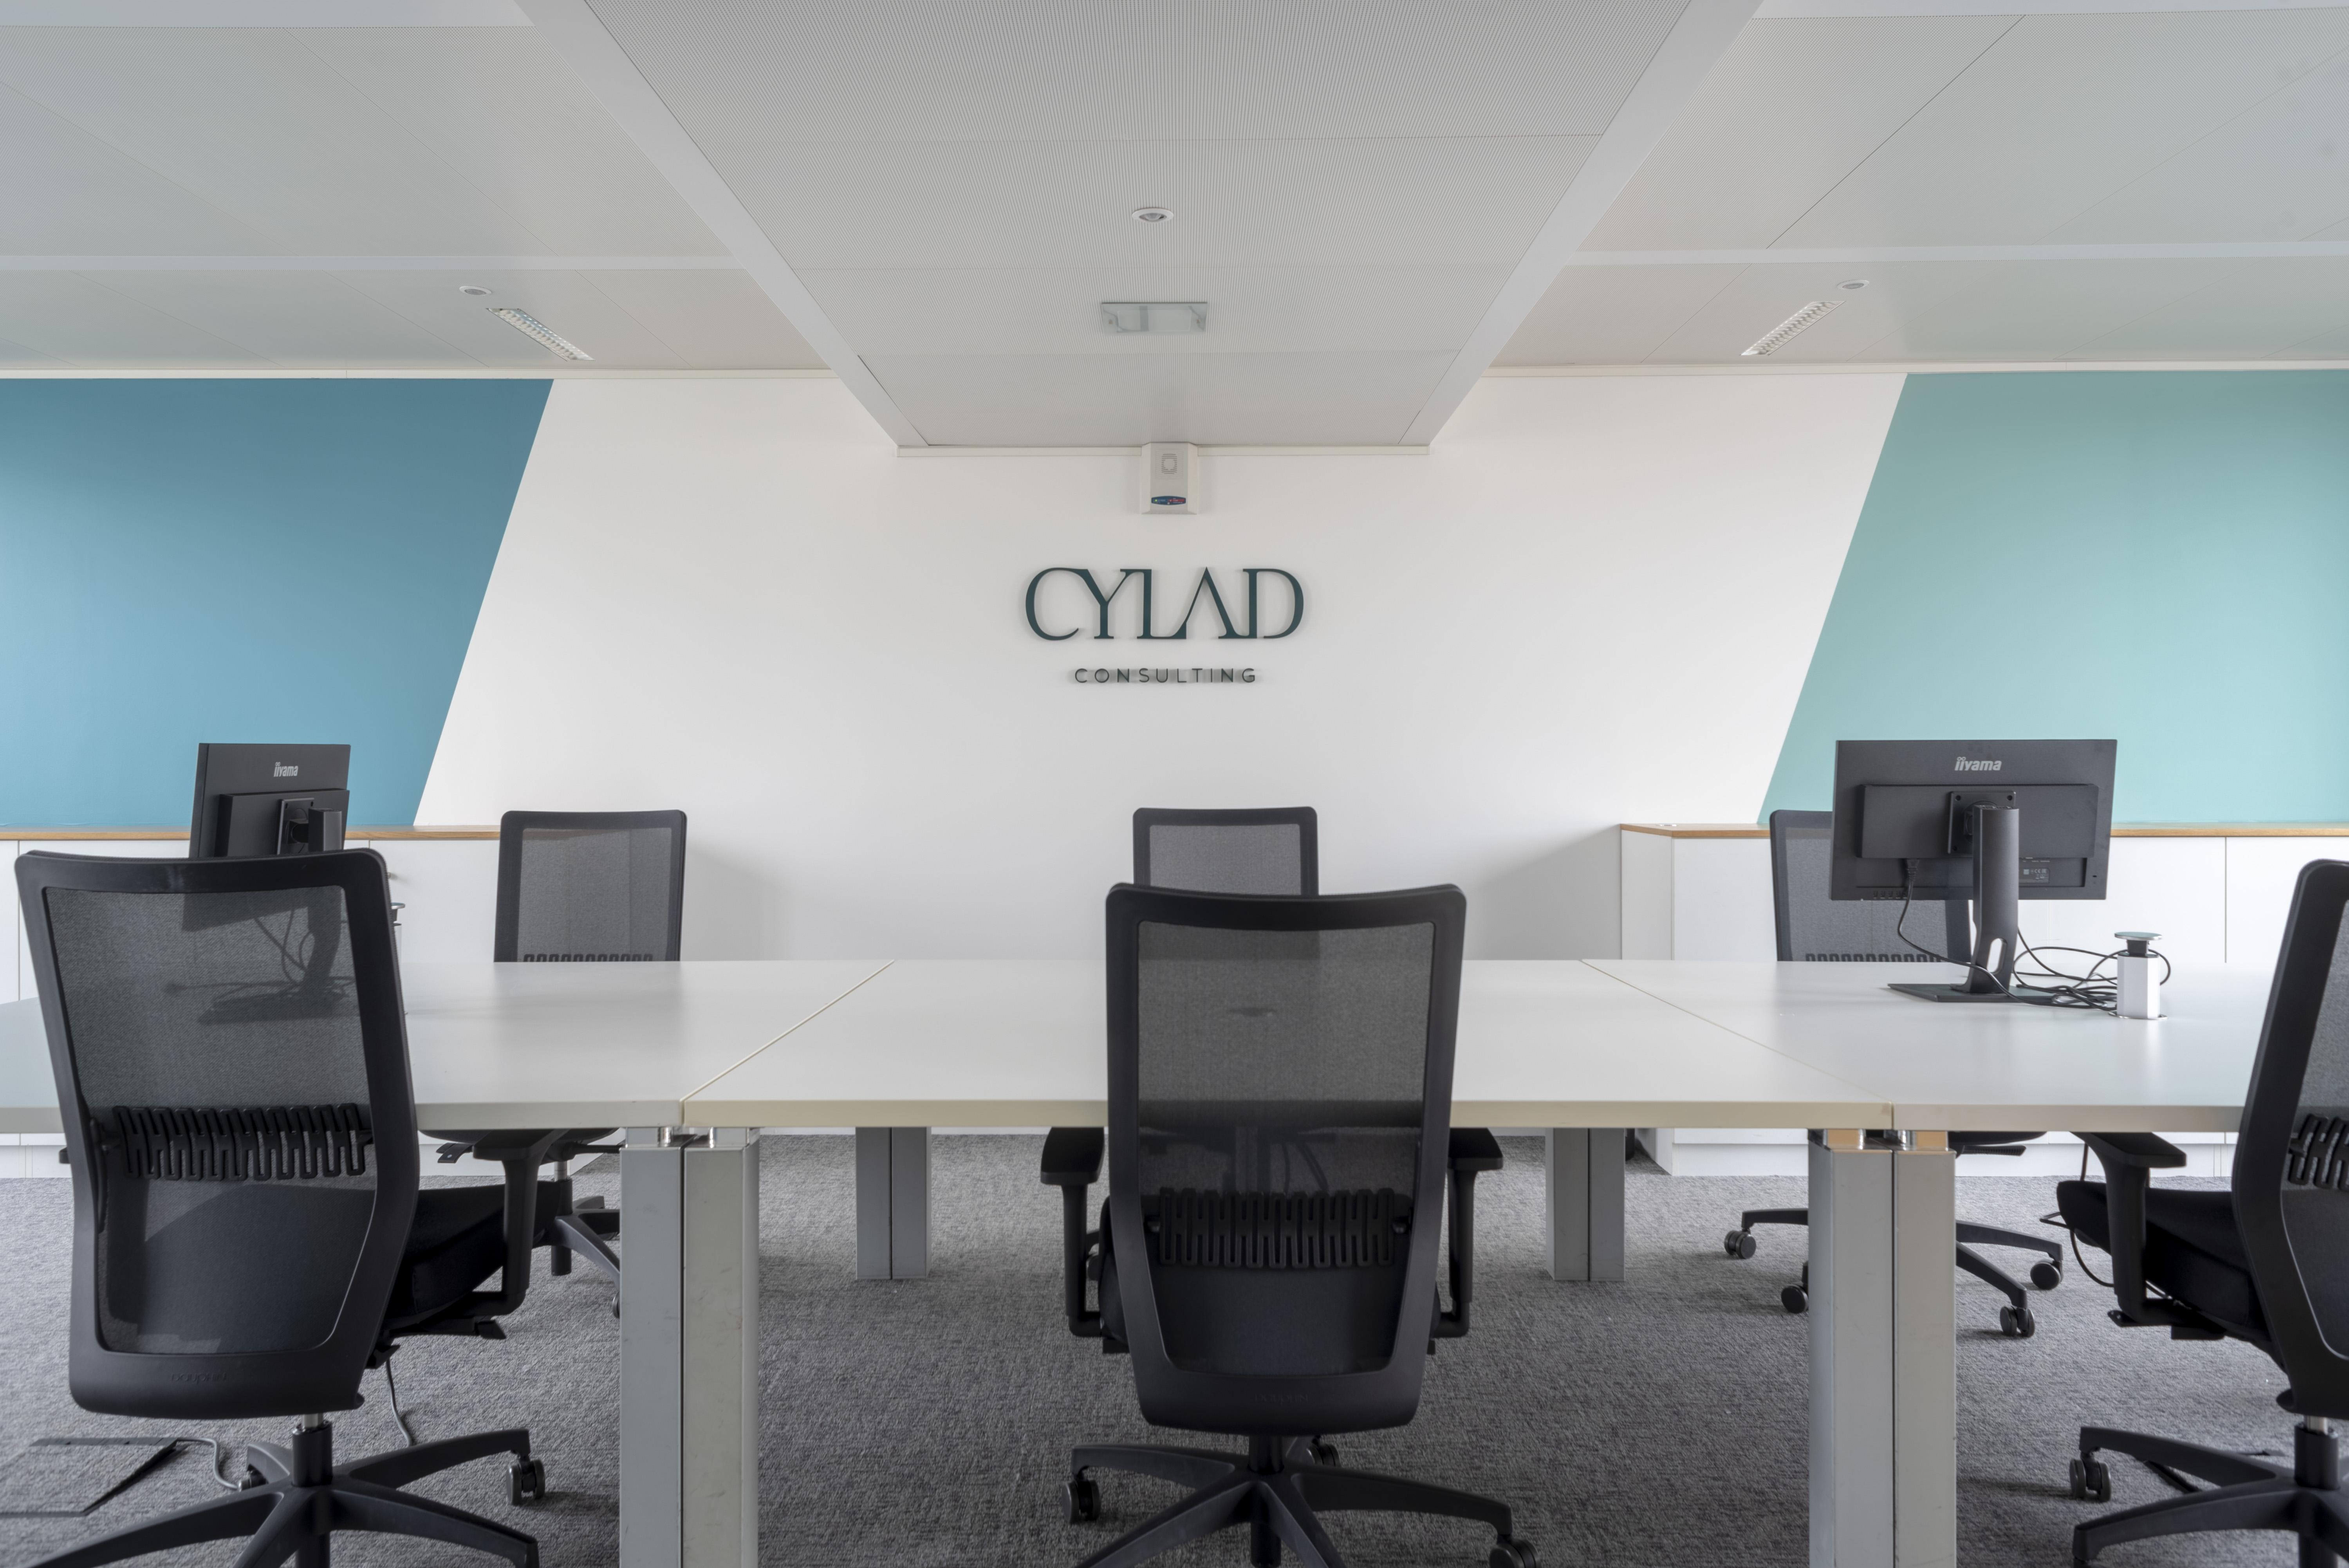 Grand bureau au style du logo